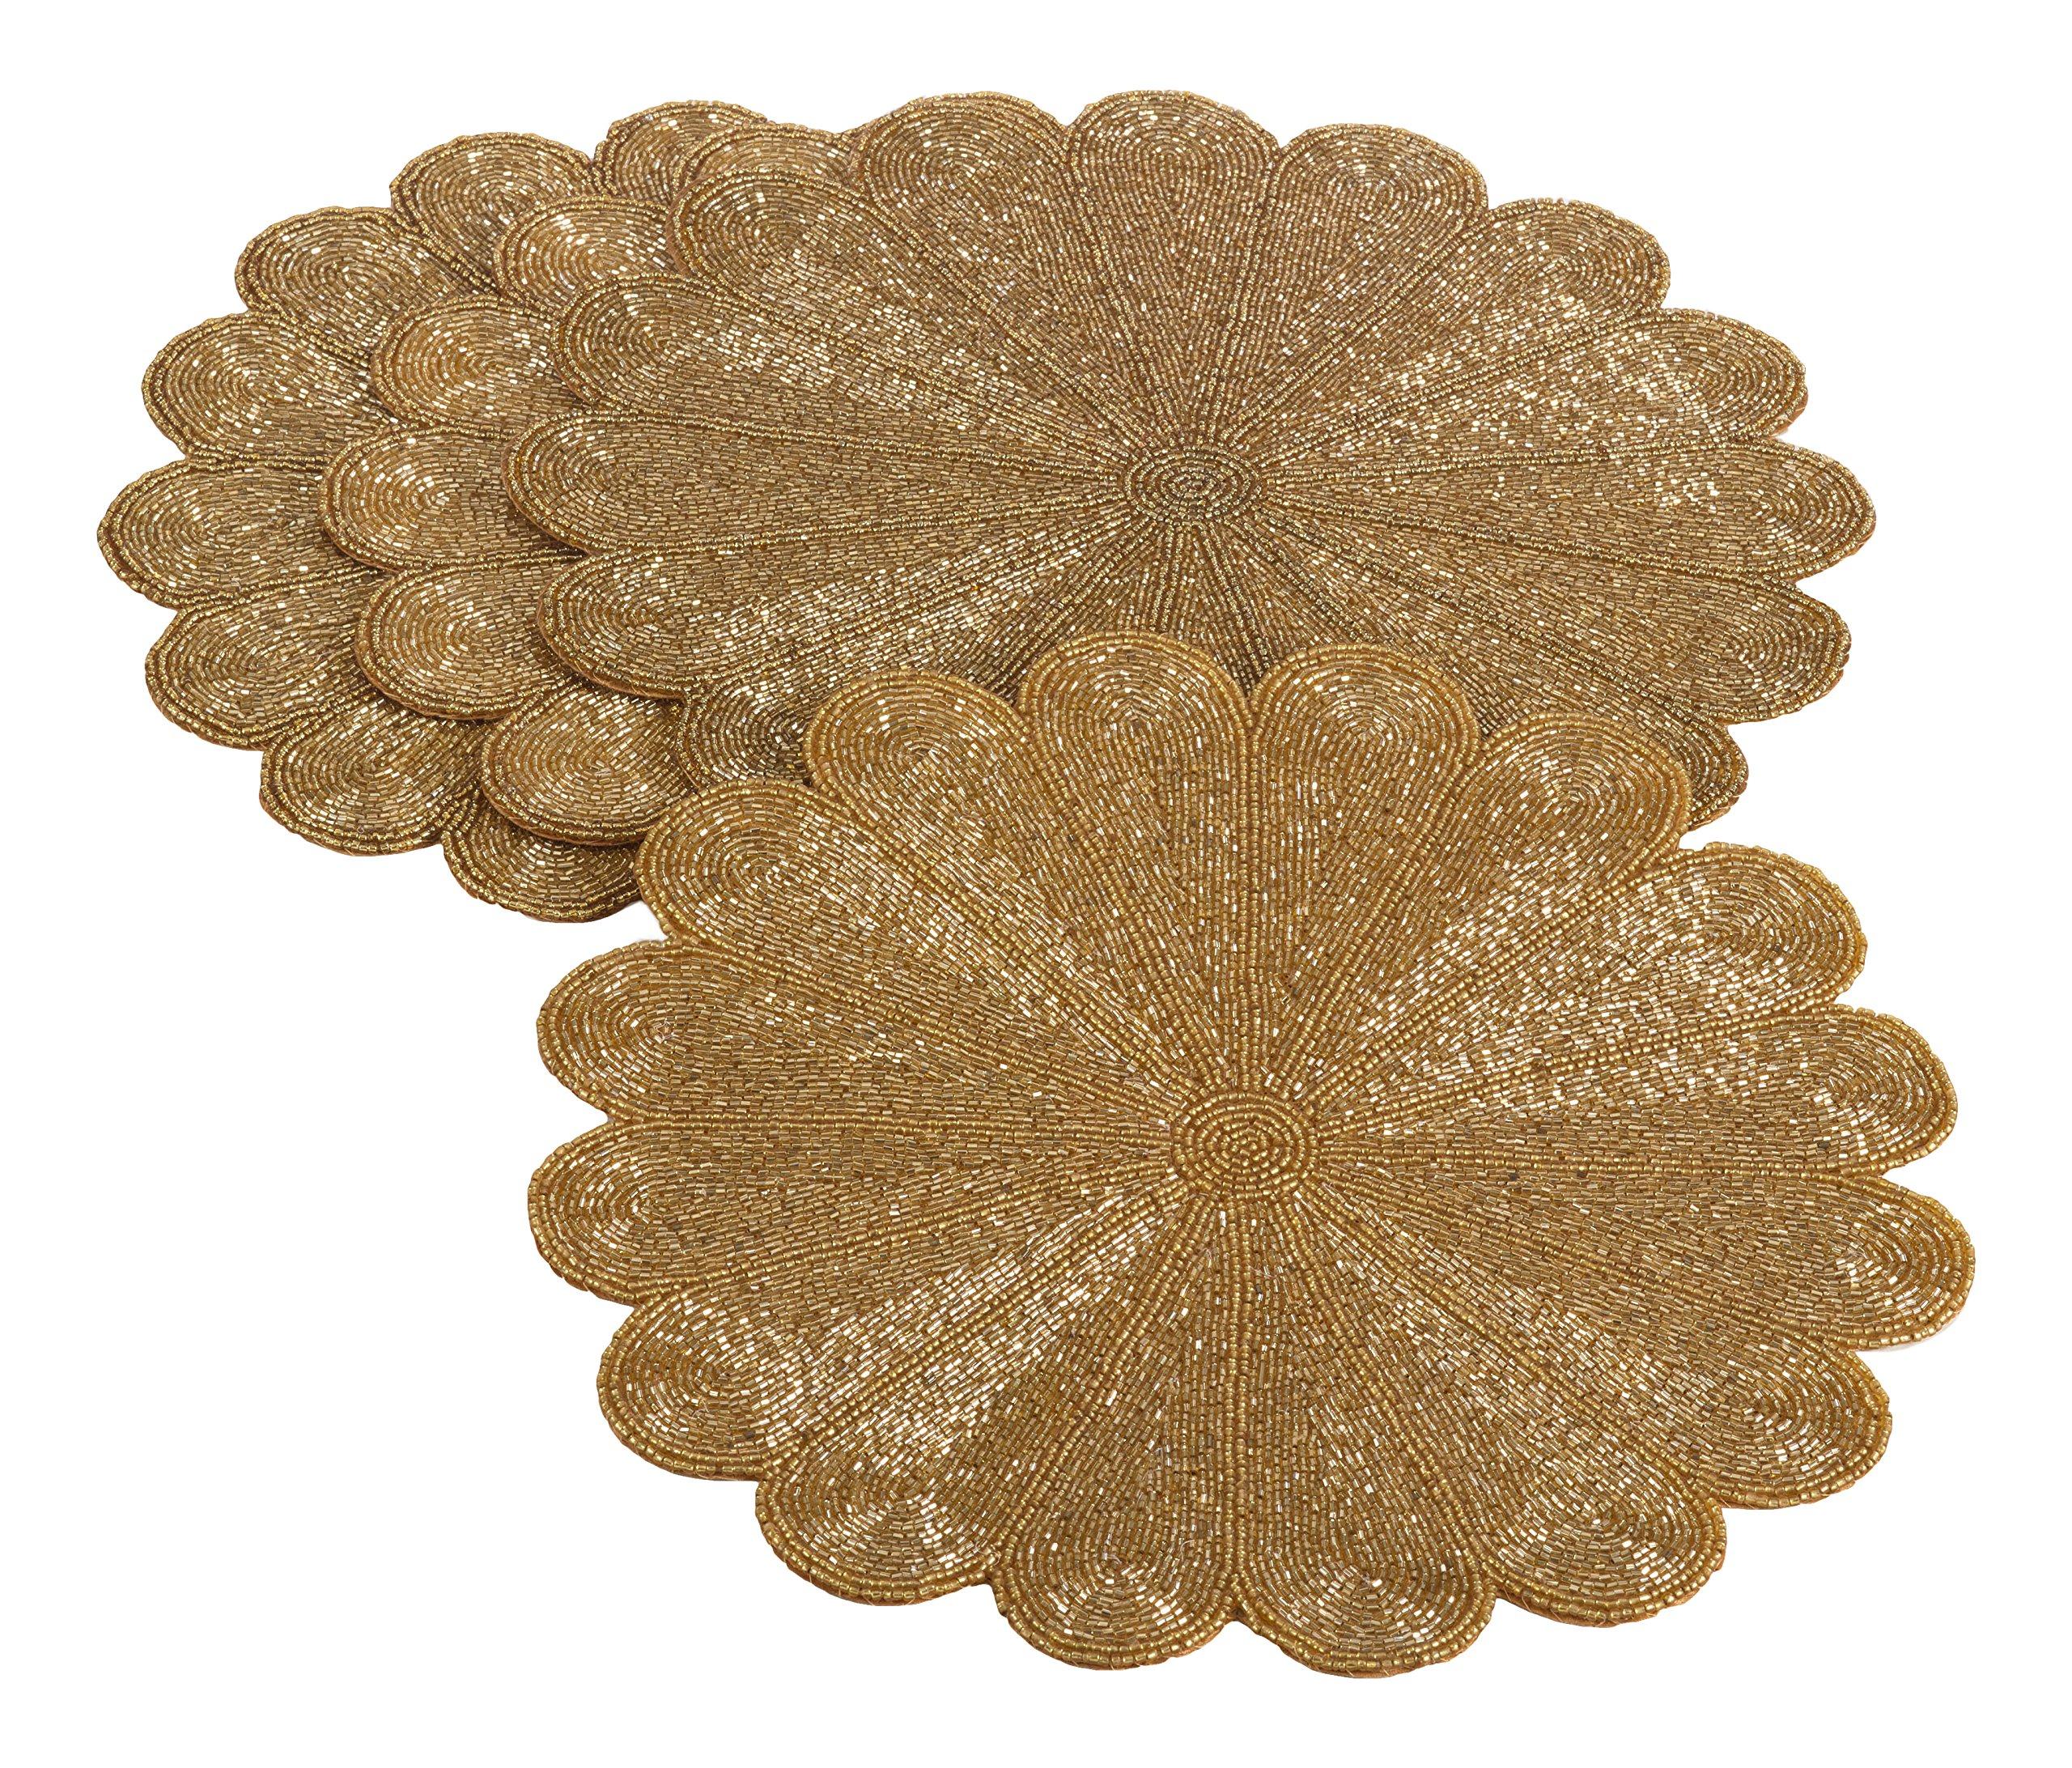 Saro LifeStyle 201.GL15R  Flower Design Beaded Placemat, Gold, 15'' (Set of 4 pcs)